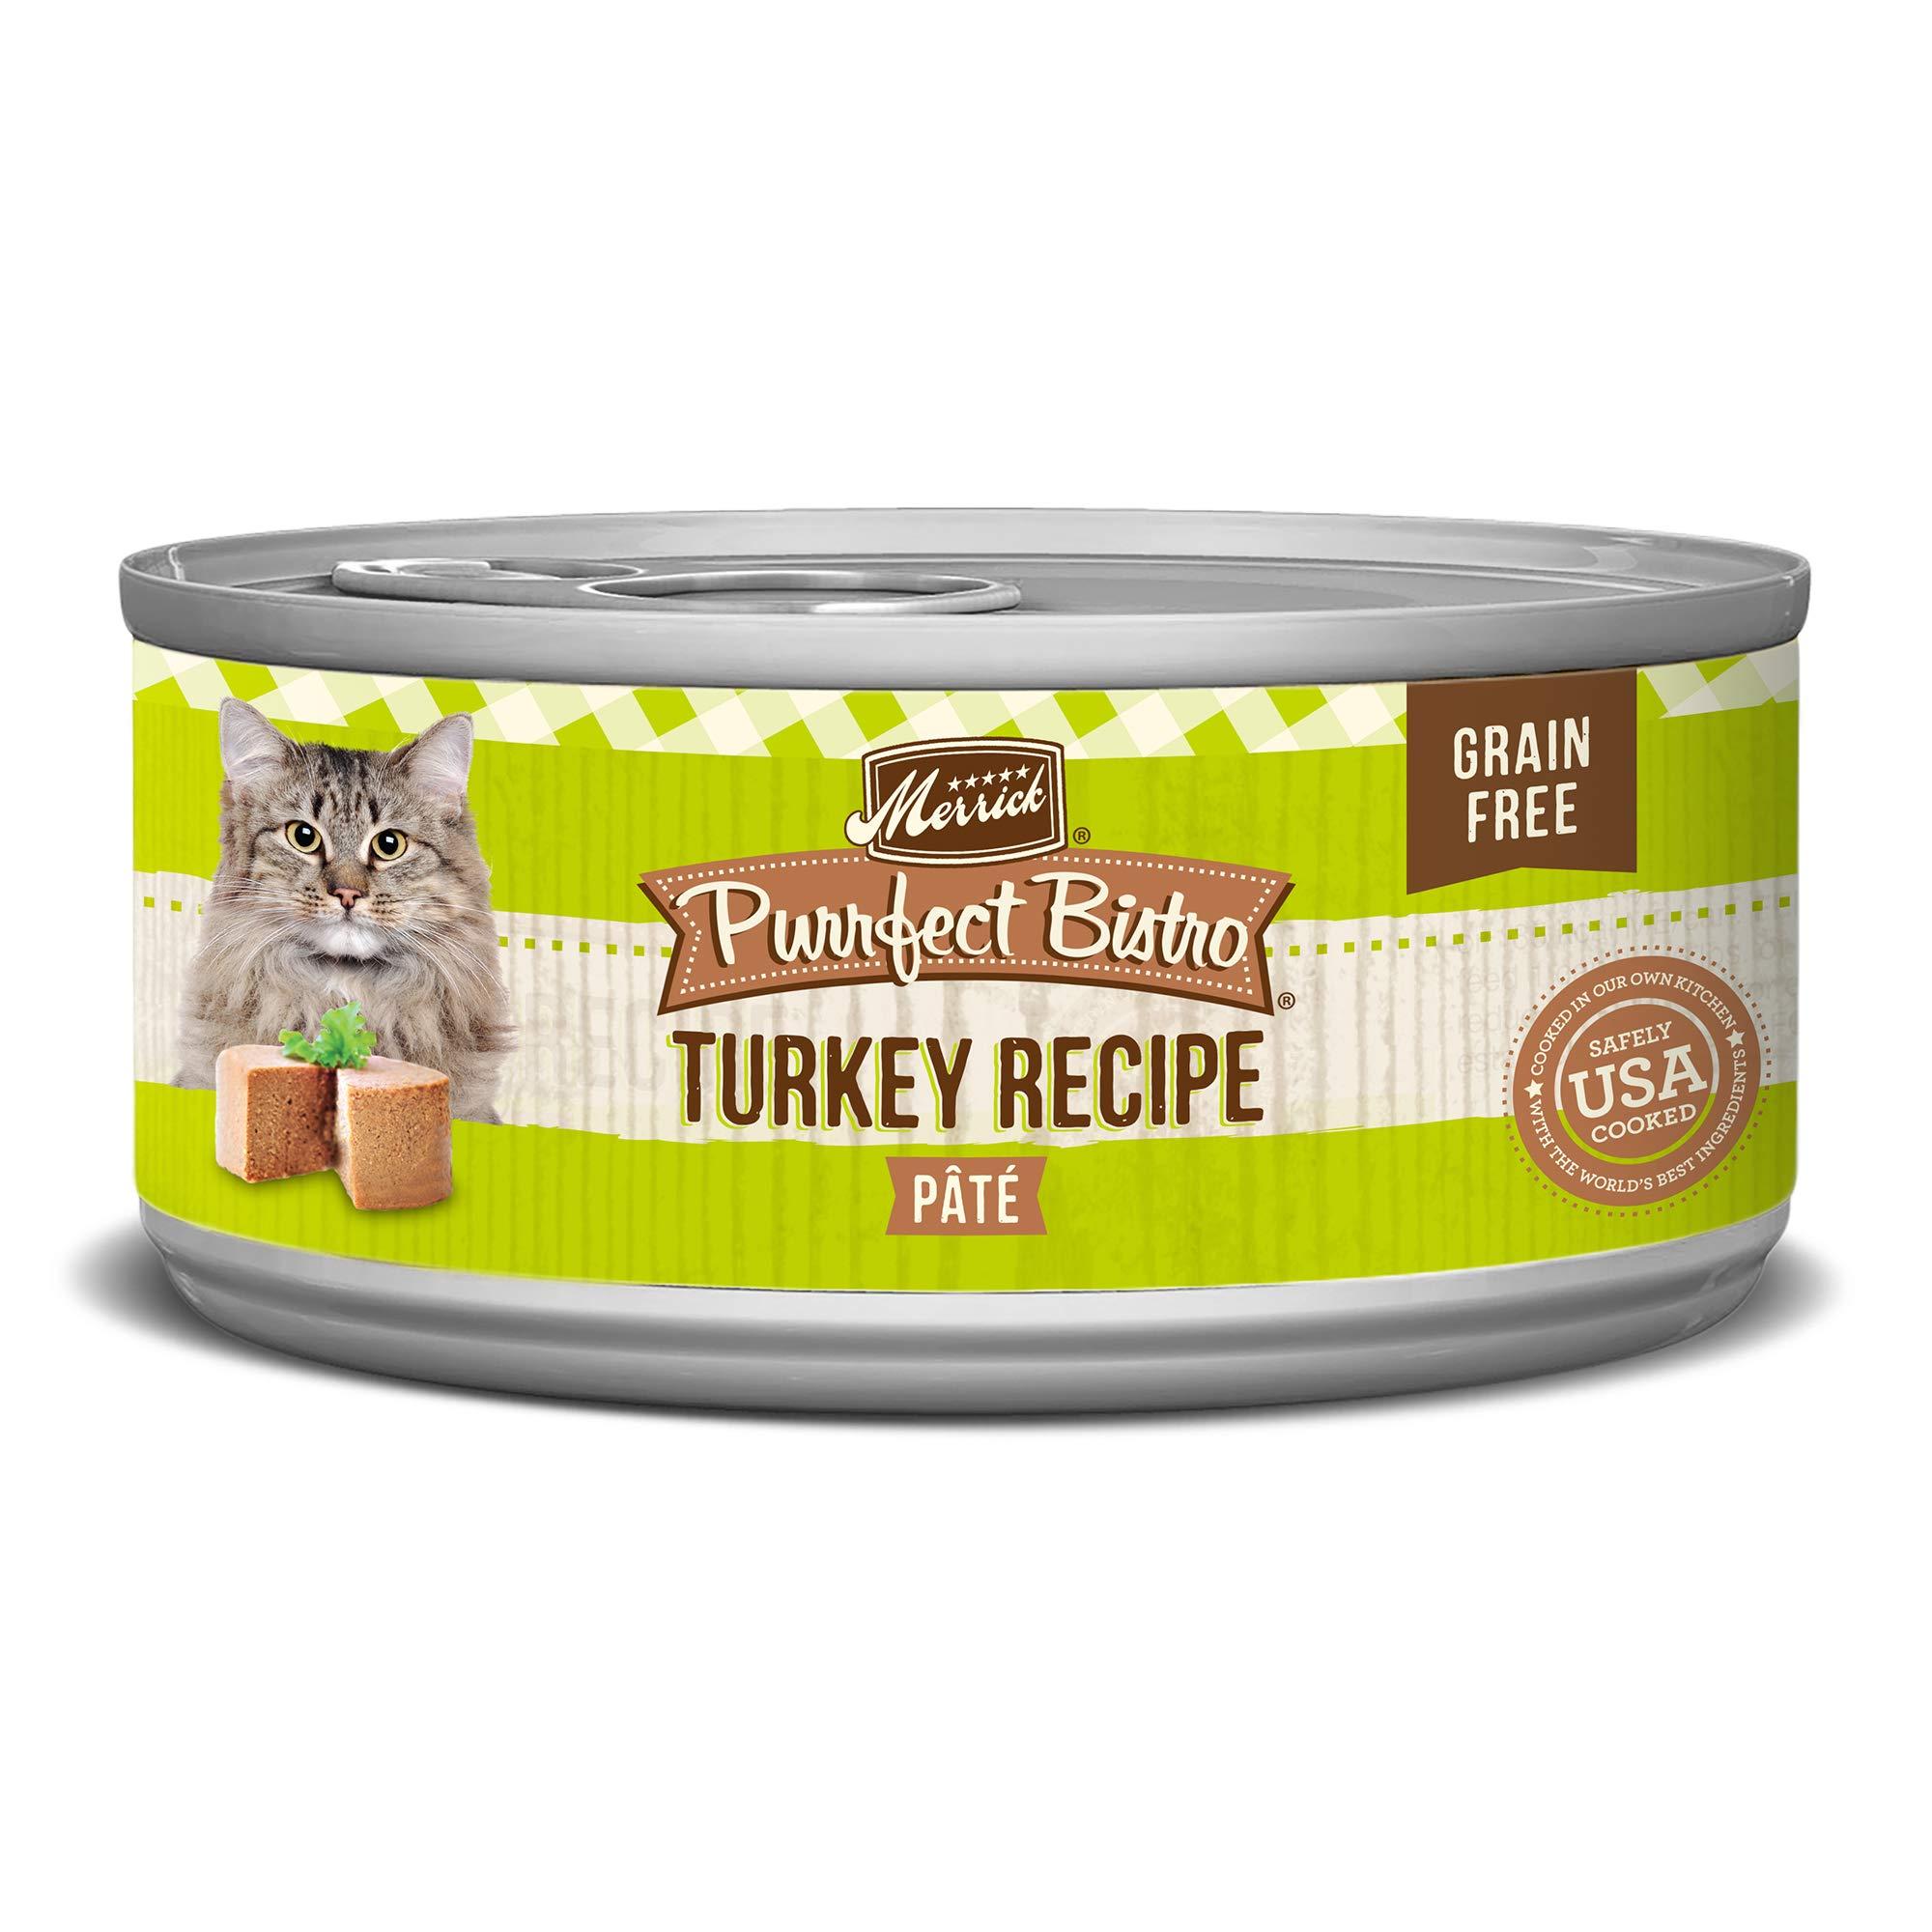 Merrick Purrfect Bistro Grain Free Turkey Pate Wet Cat Food, Case of 24, 5.5 oz by Merrick